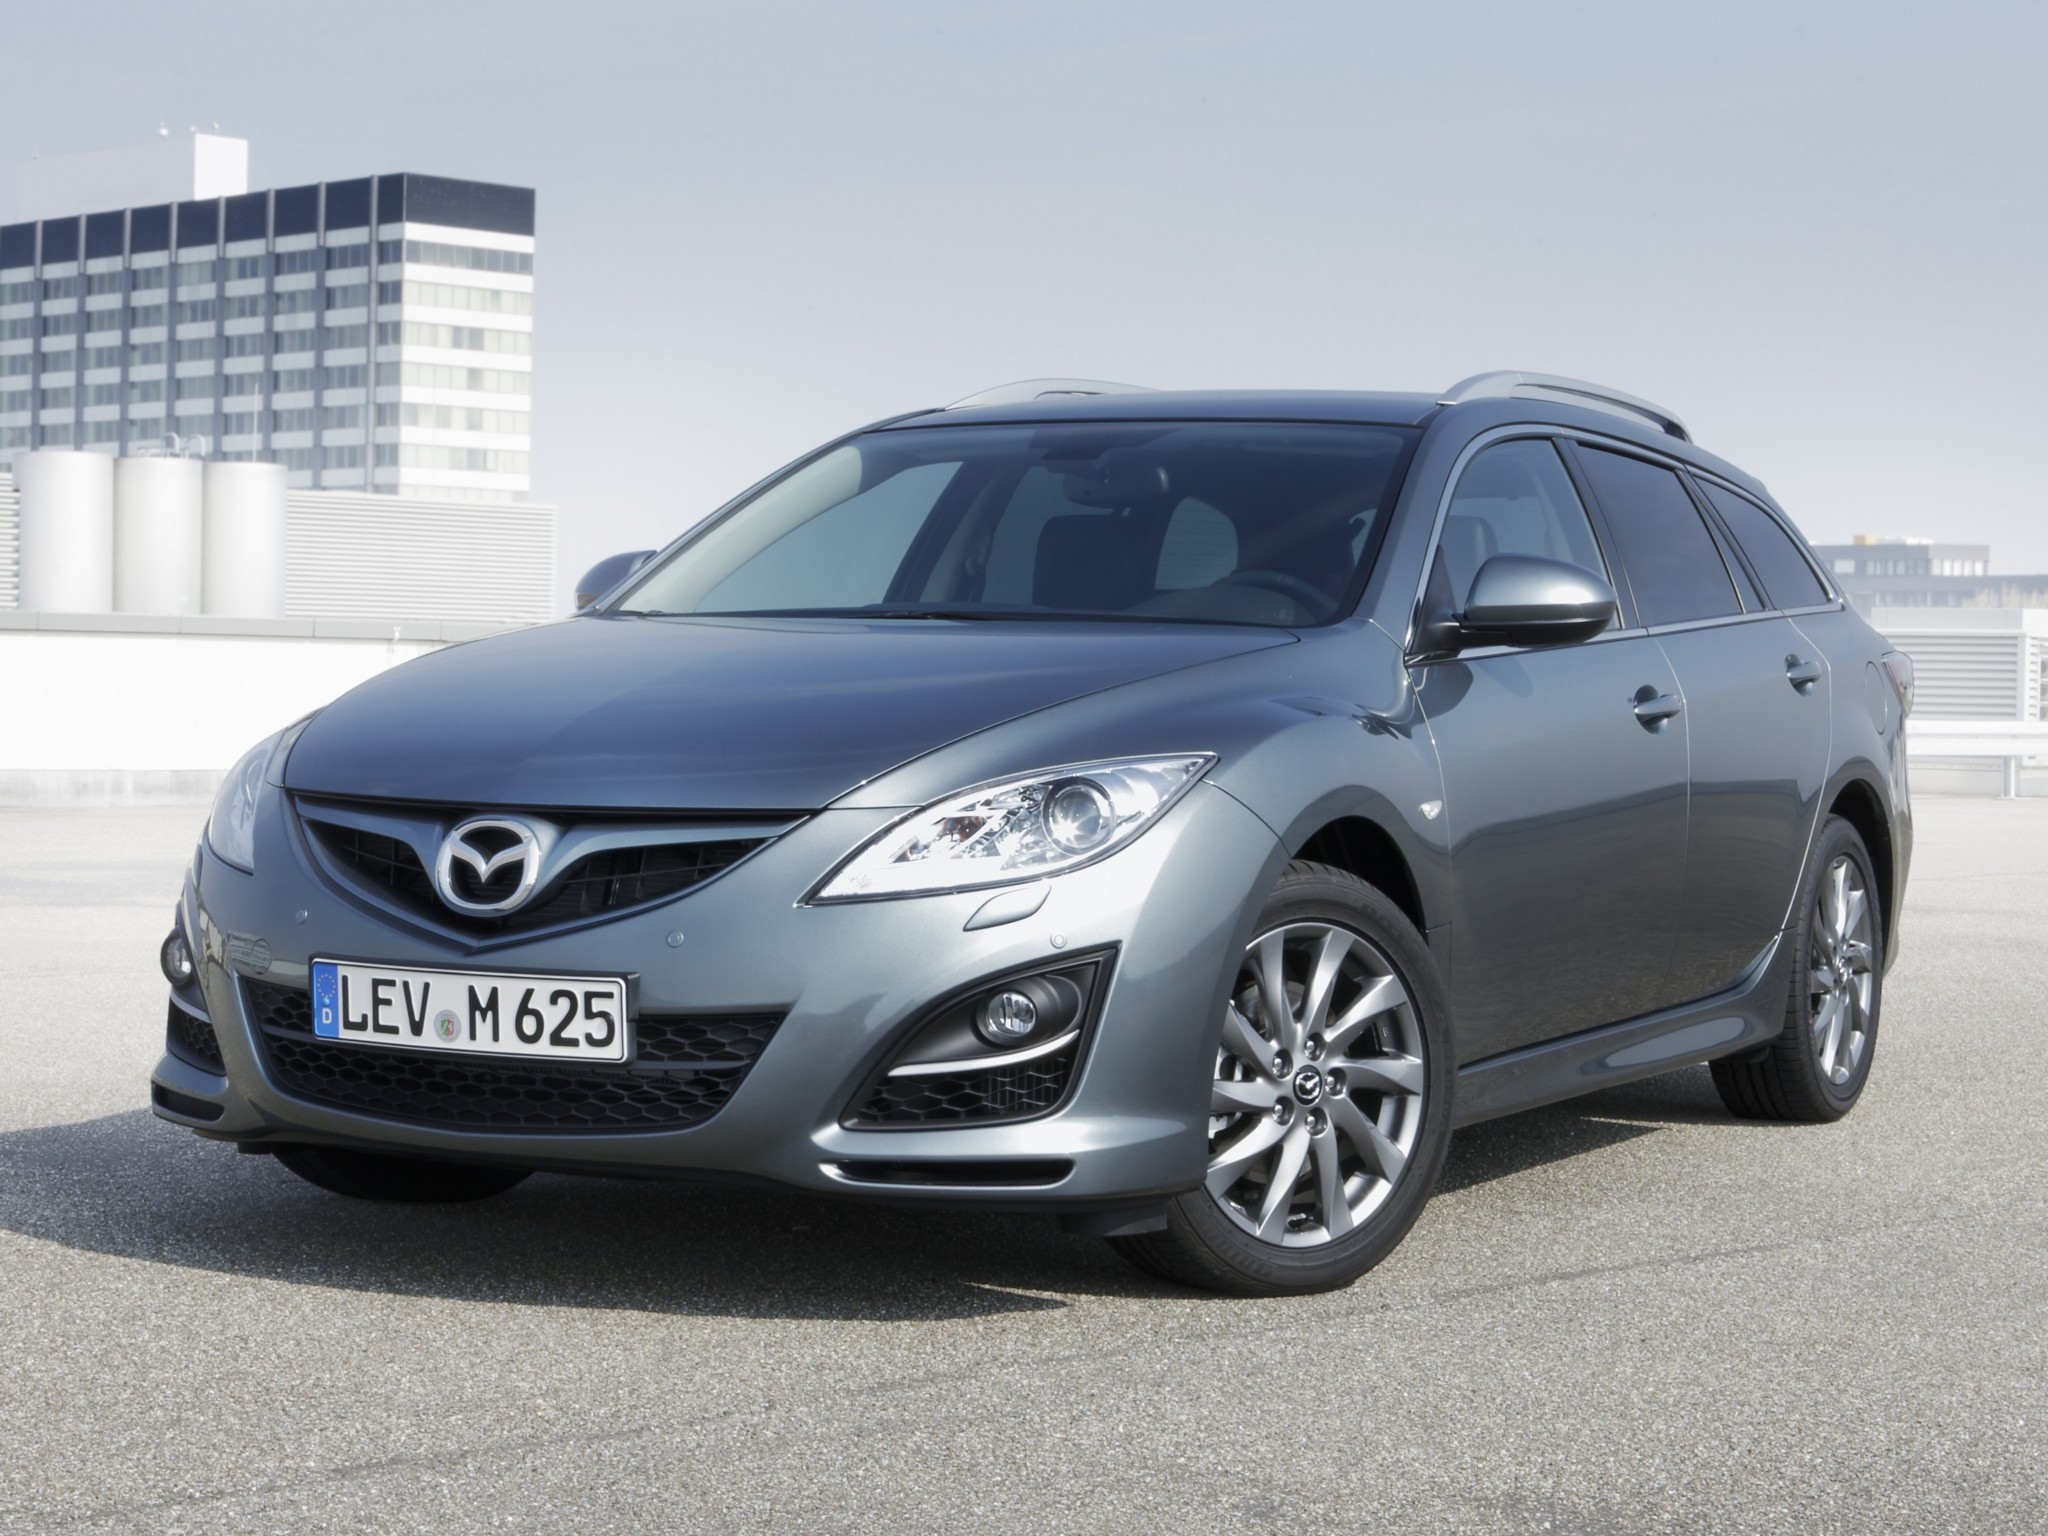 2012 Mazda 6 Wagon Edition 40